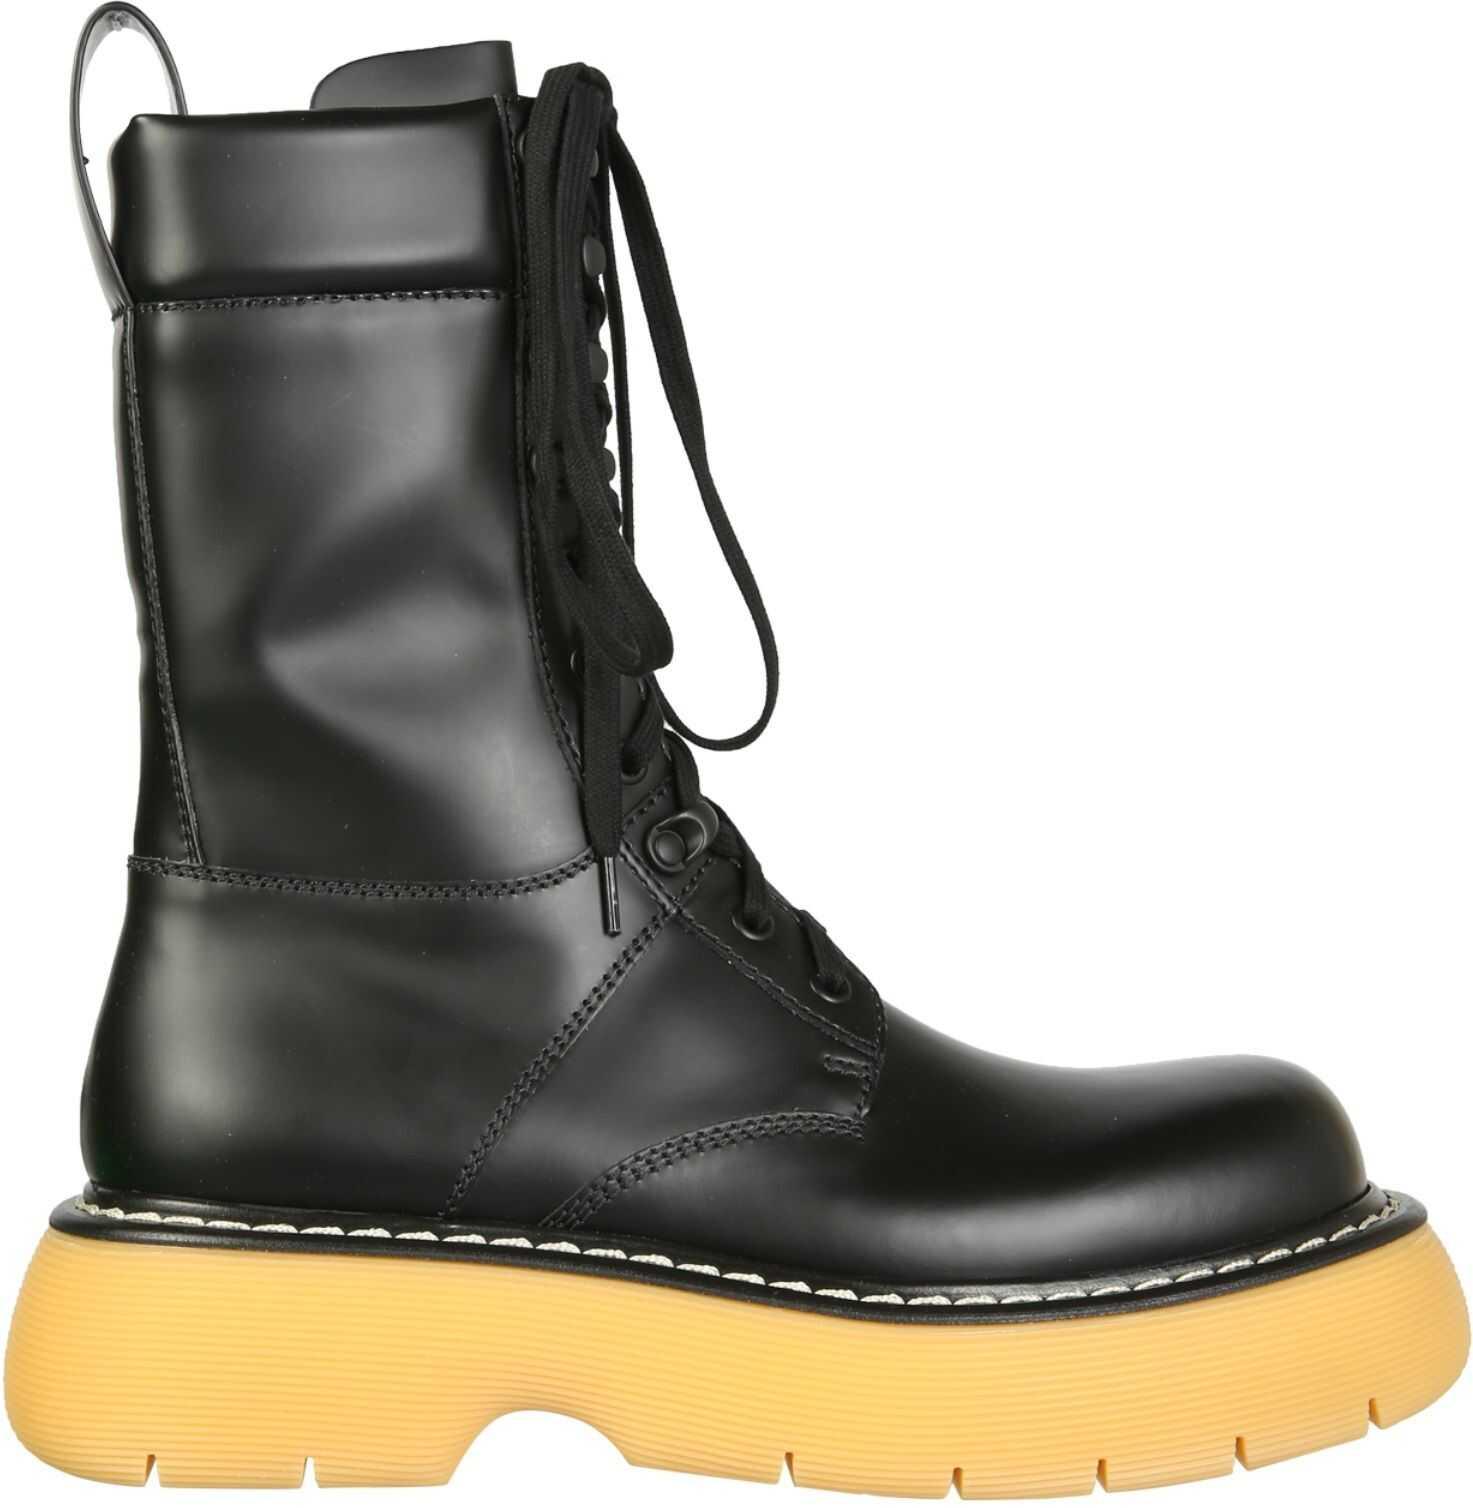 Bottega Veneta The Bounce Boots 651411_V00H01032 BLACK imagine b-mall.ro